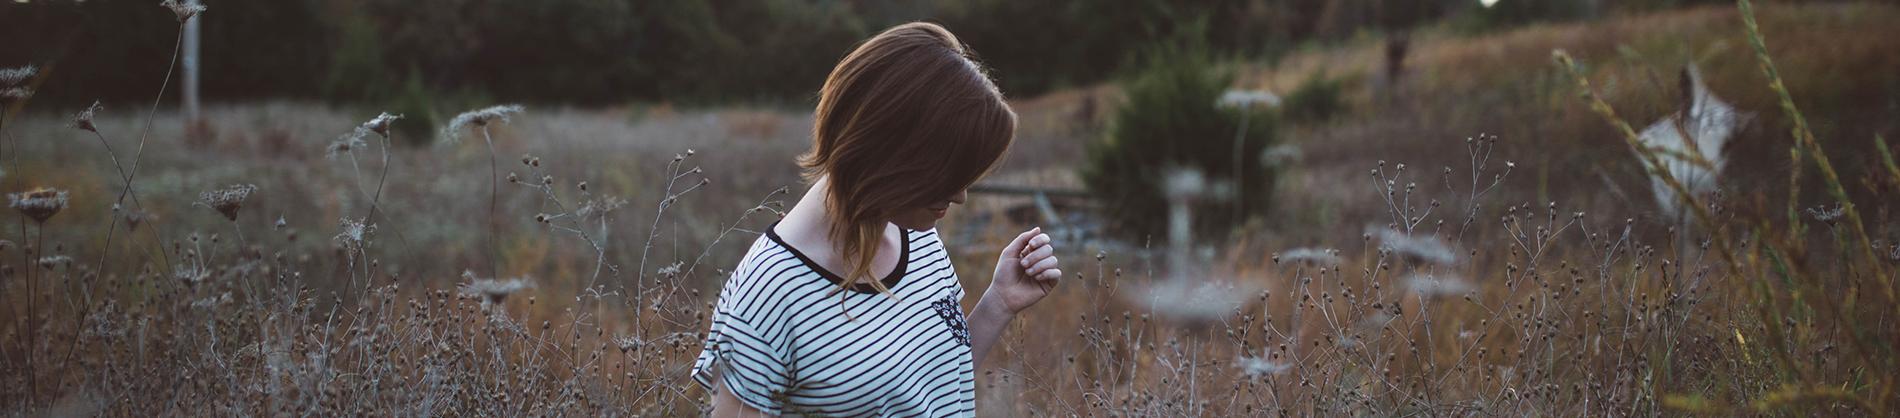 Girl walking through a field